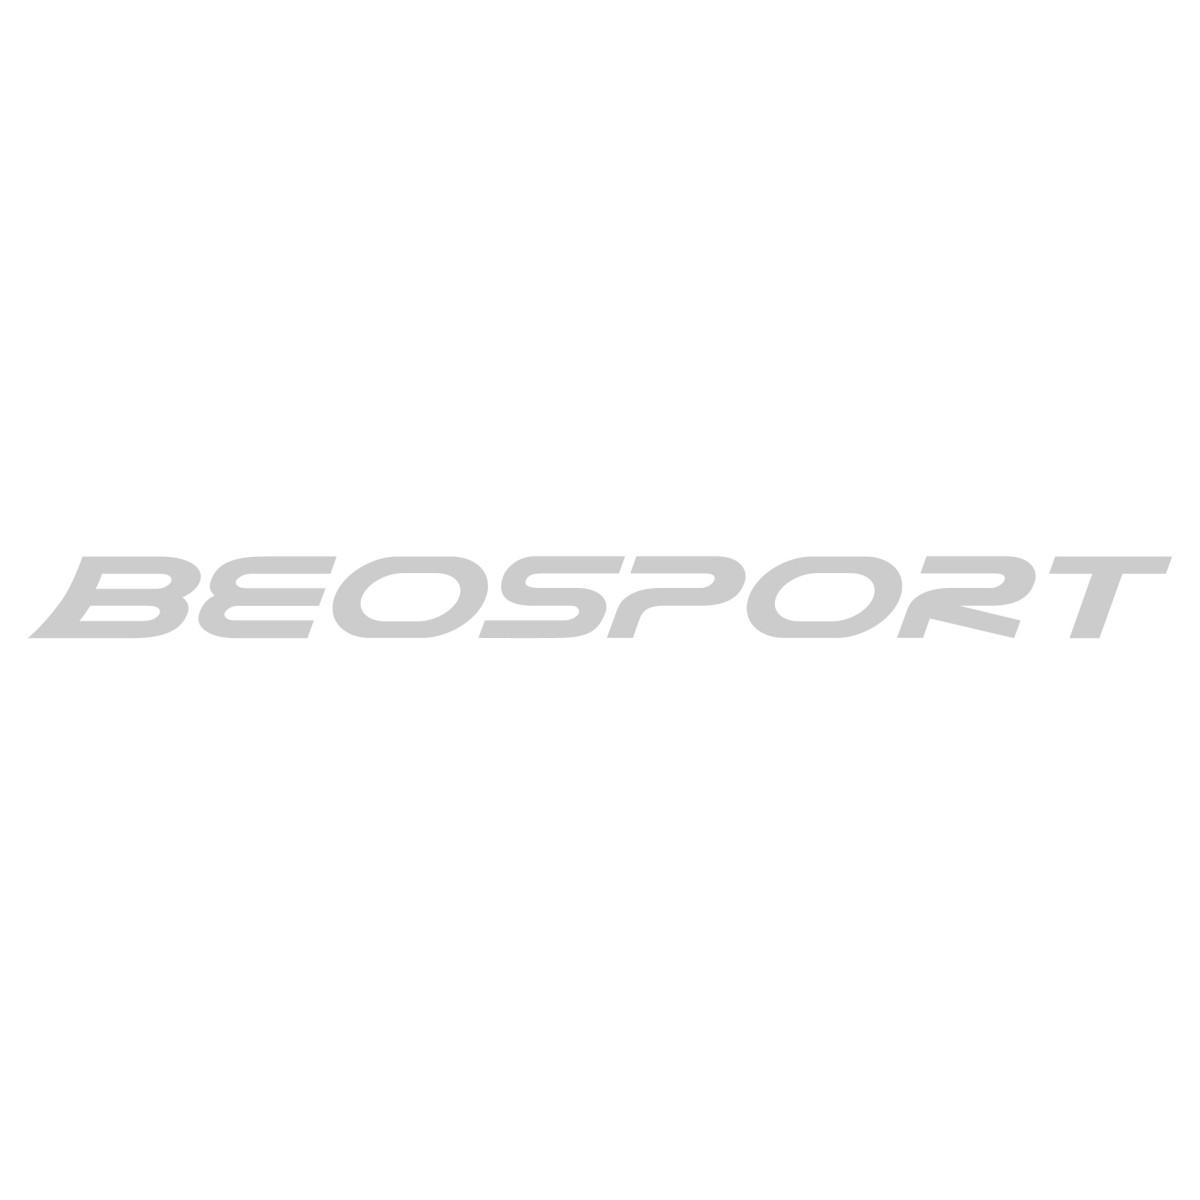 Bench Sprinter trenerka